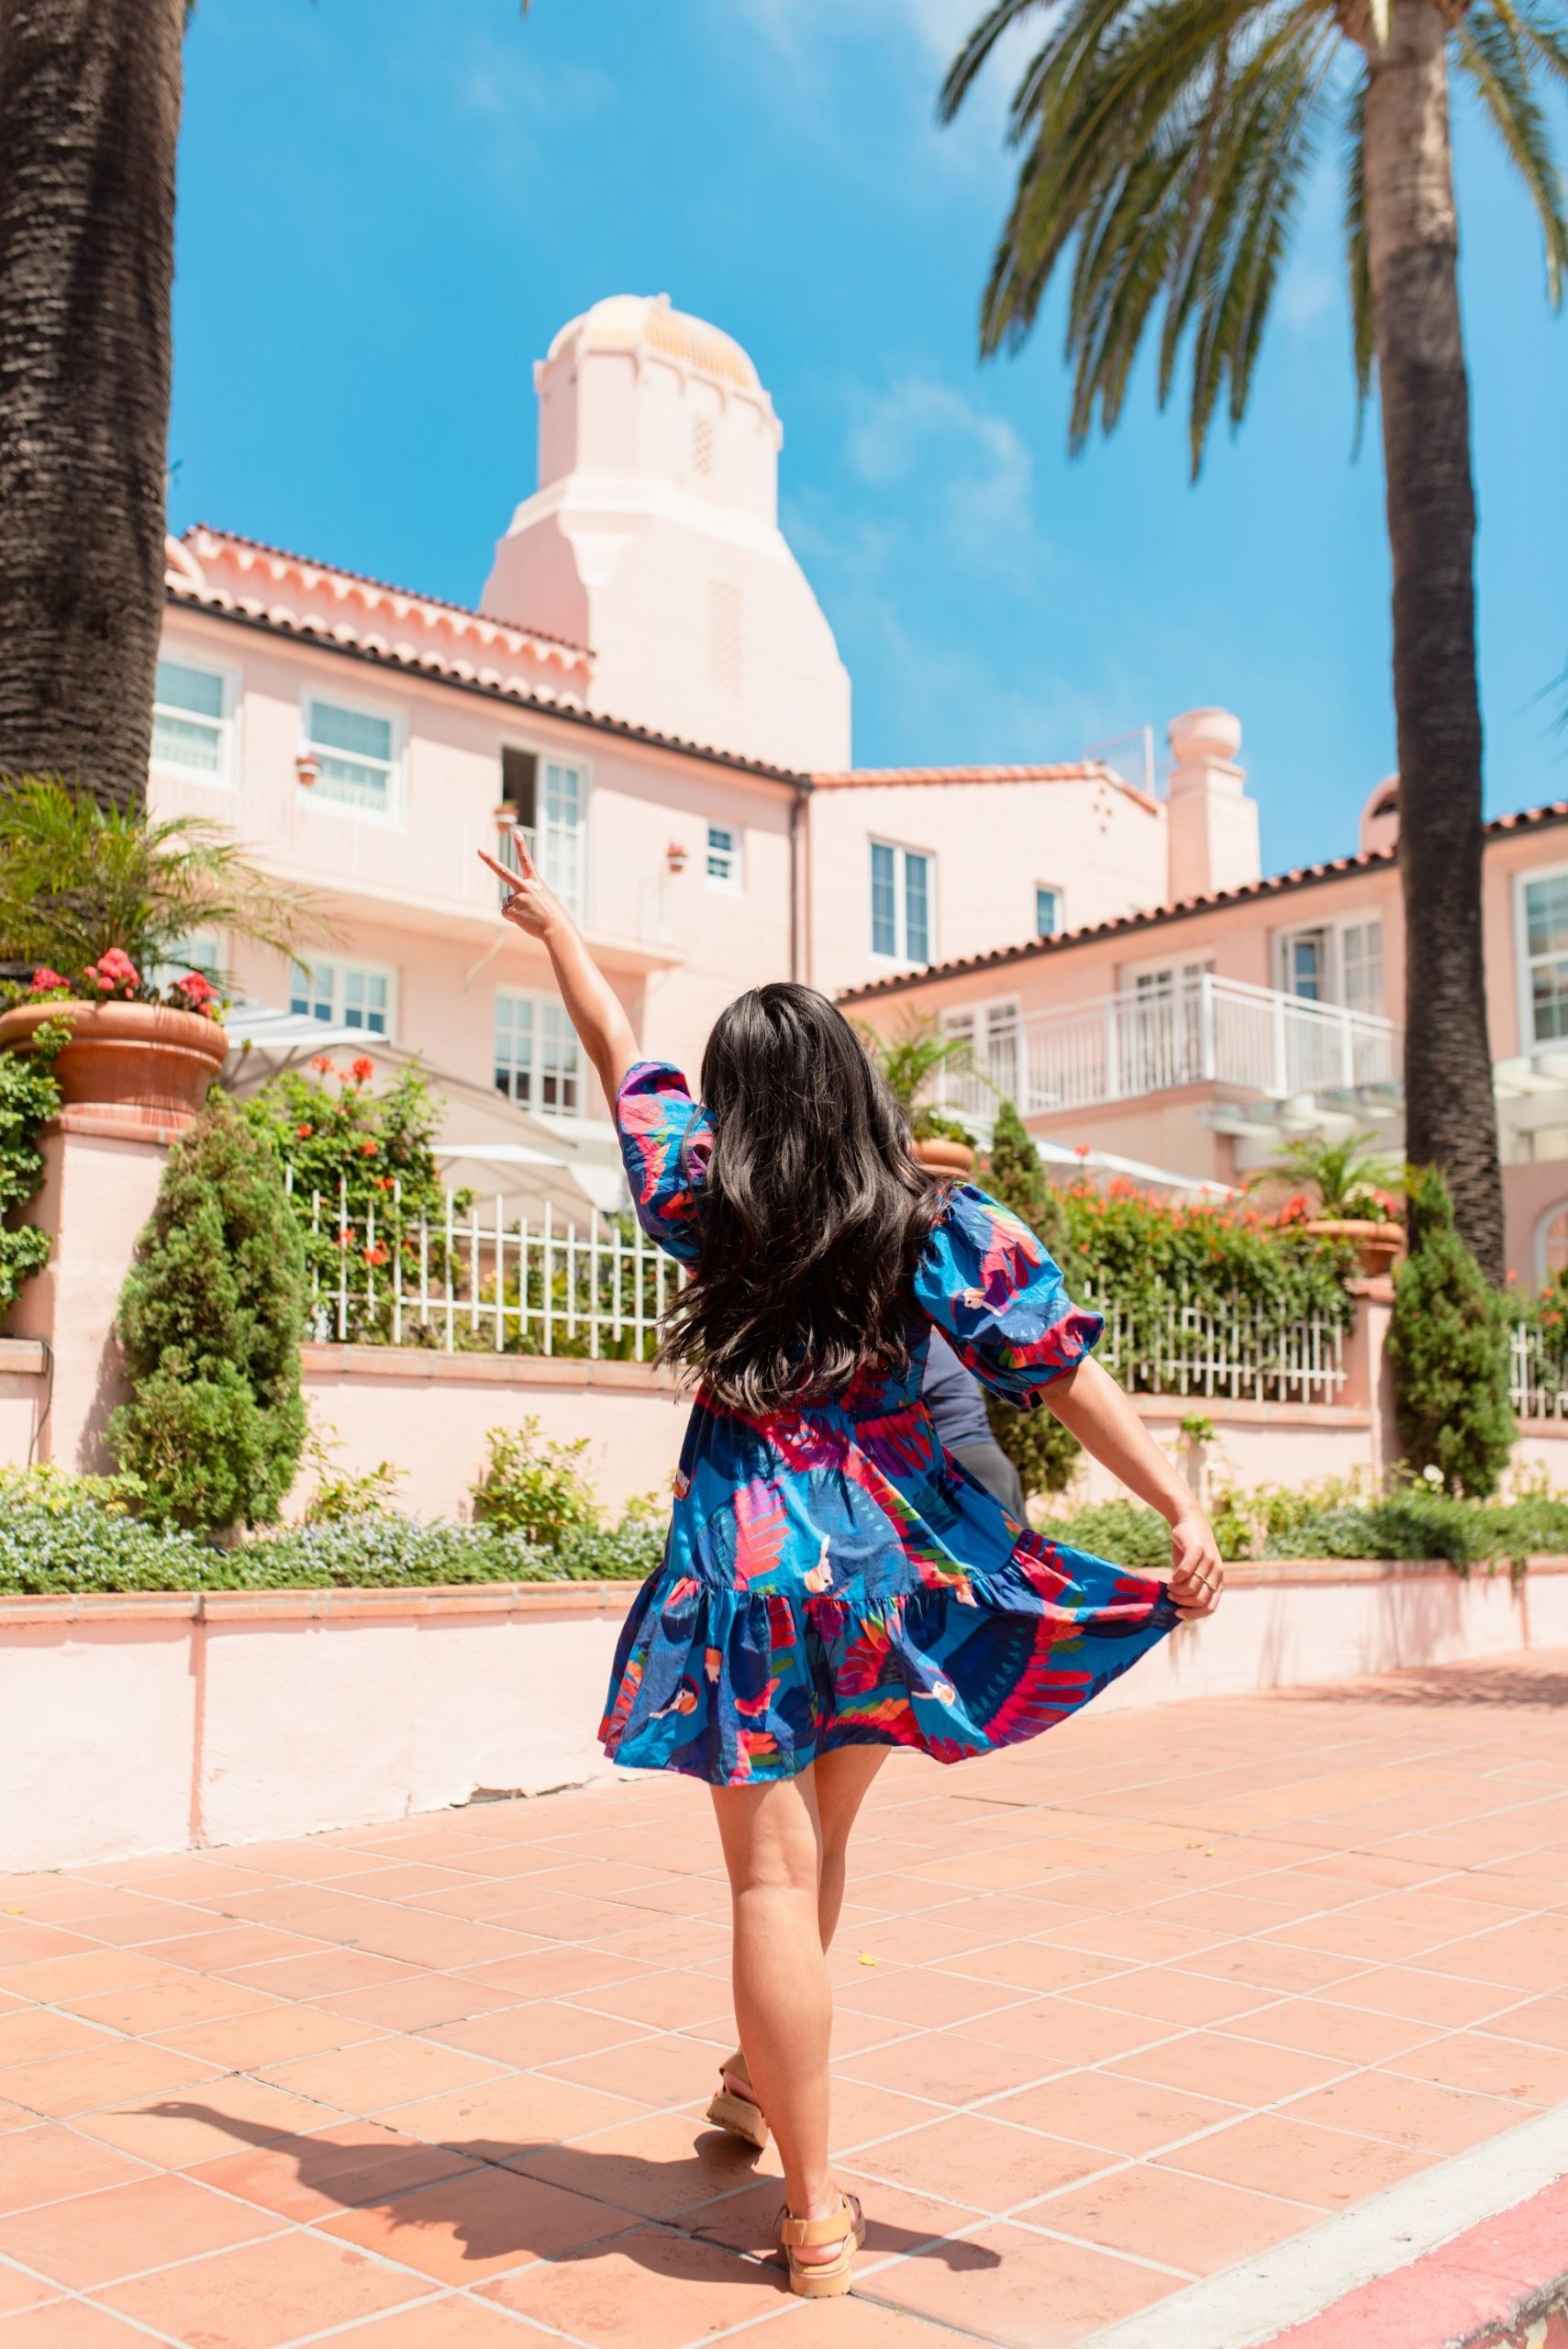 Pink San Diego photoshoot locations - La Valencia Hotel La Jolla San Diego - Karya Schanilec Photography